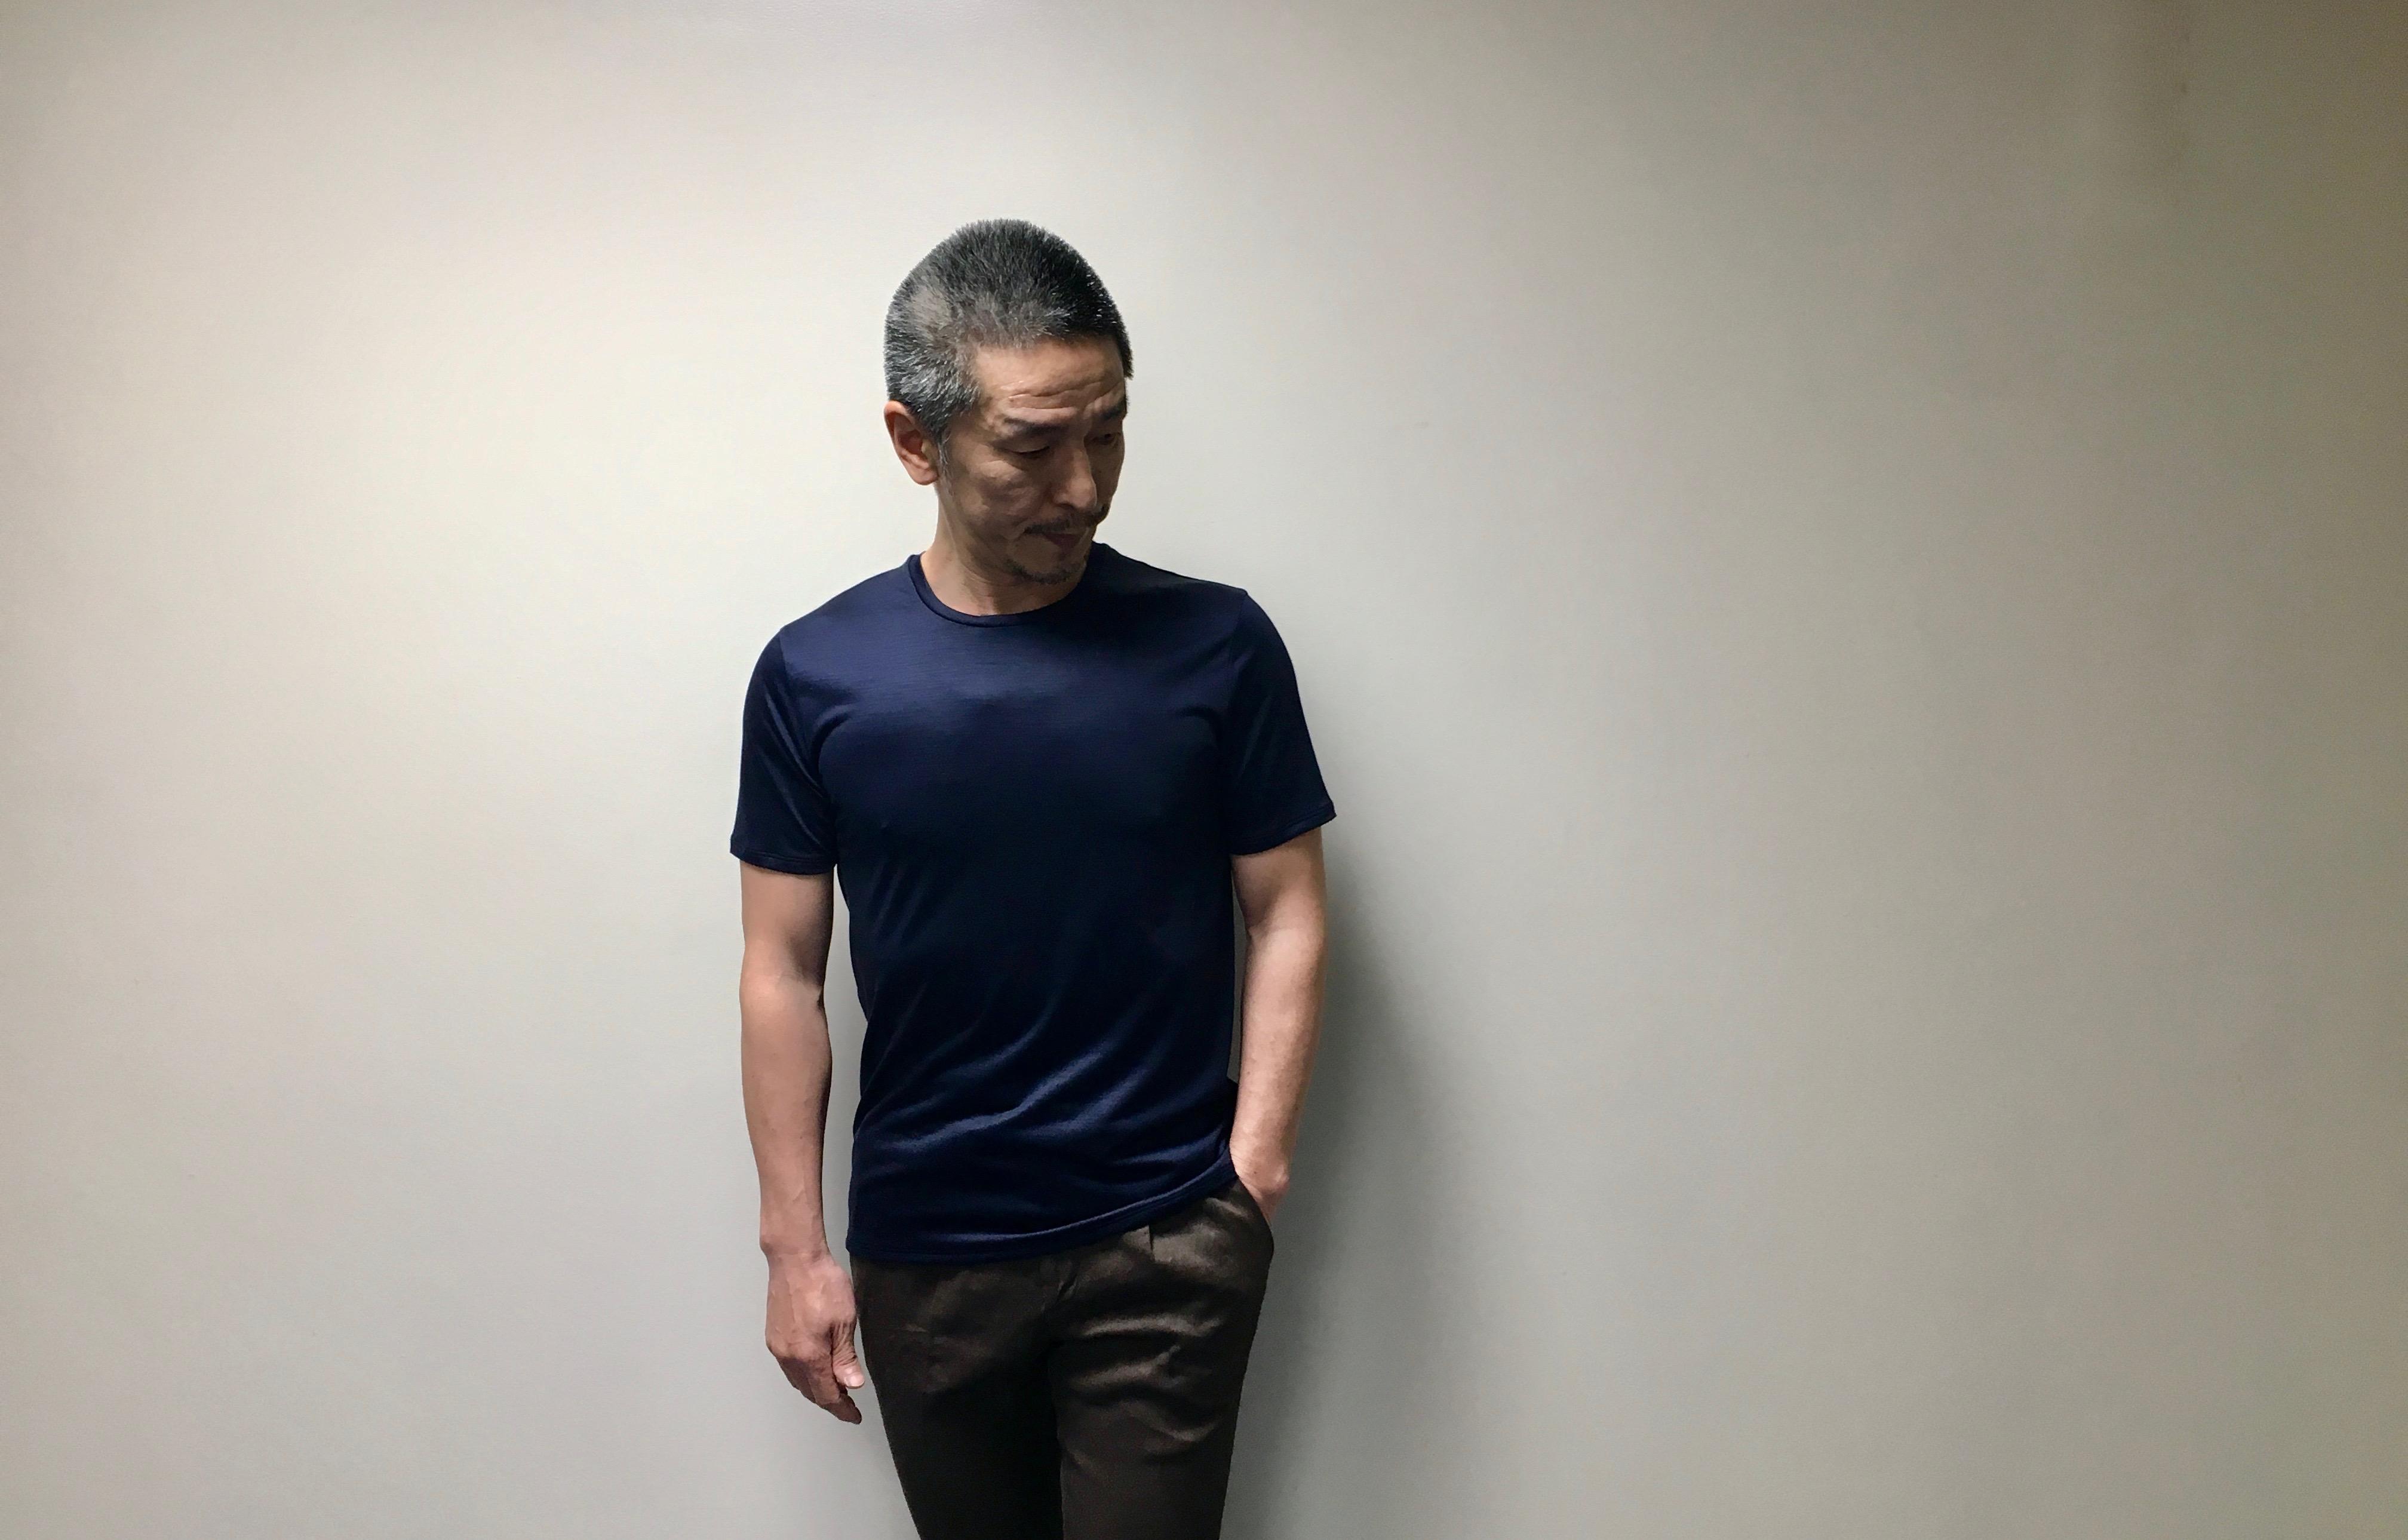 CENTO☆MICHELACCIDANILO/ミケラッチダニーロ